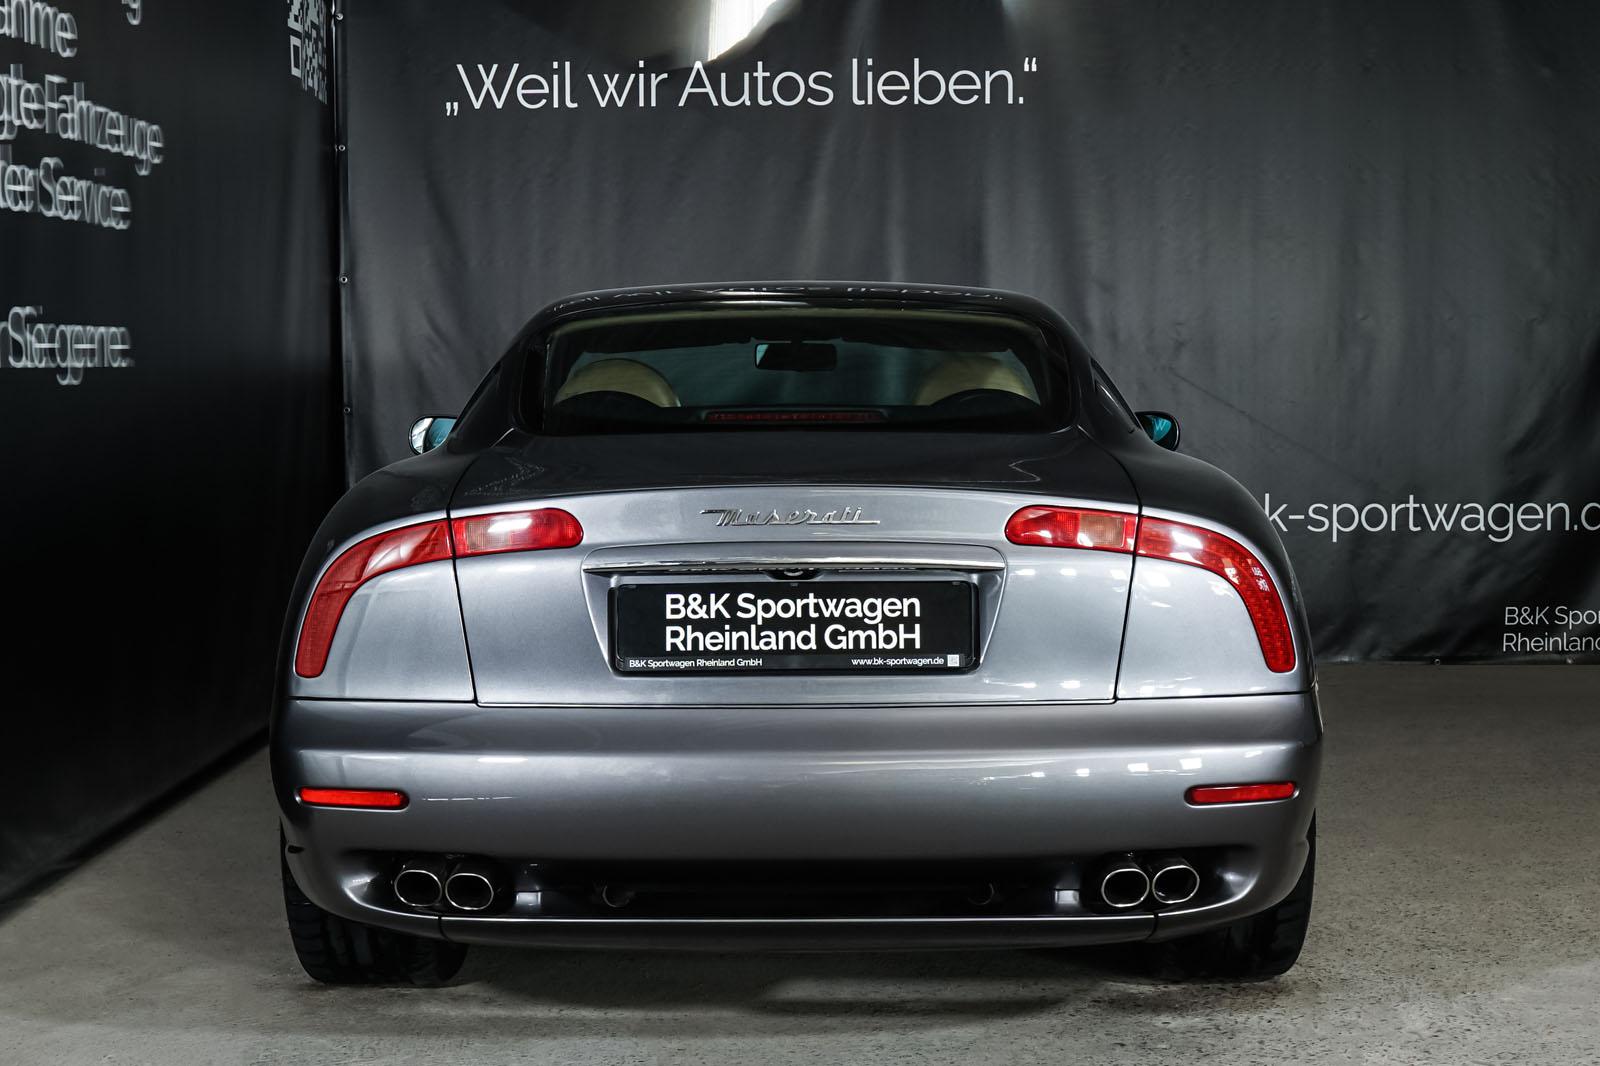 Maserati_3200_GTA_Grau_Beige_MAS-0874_14_w